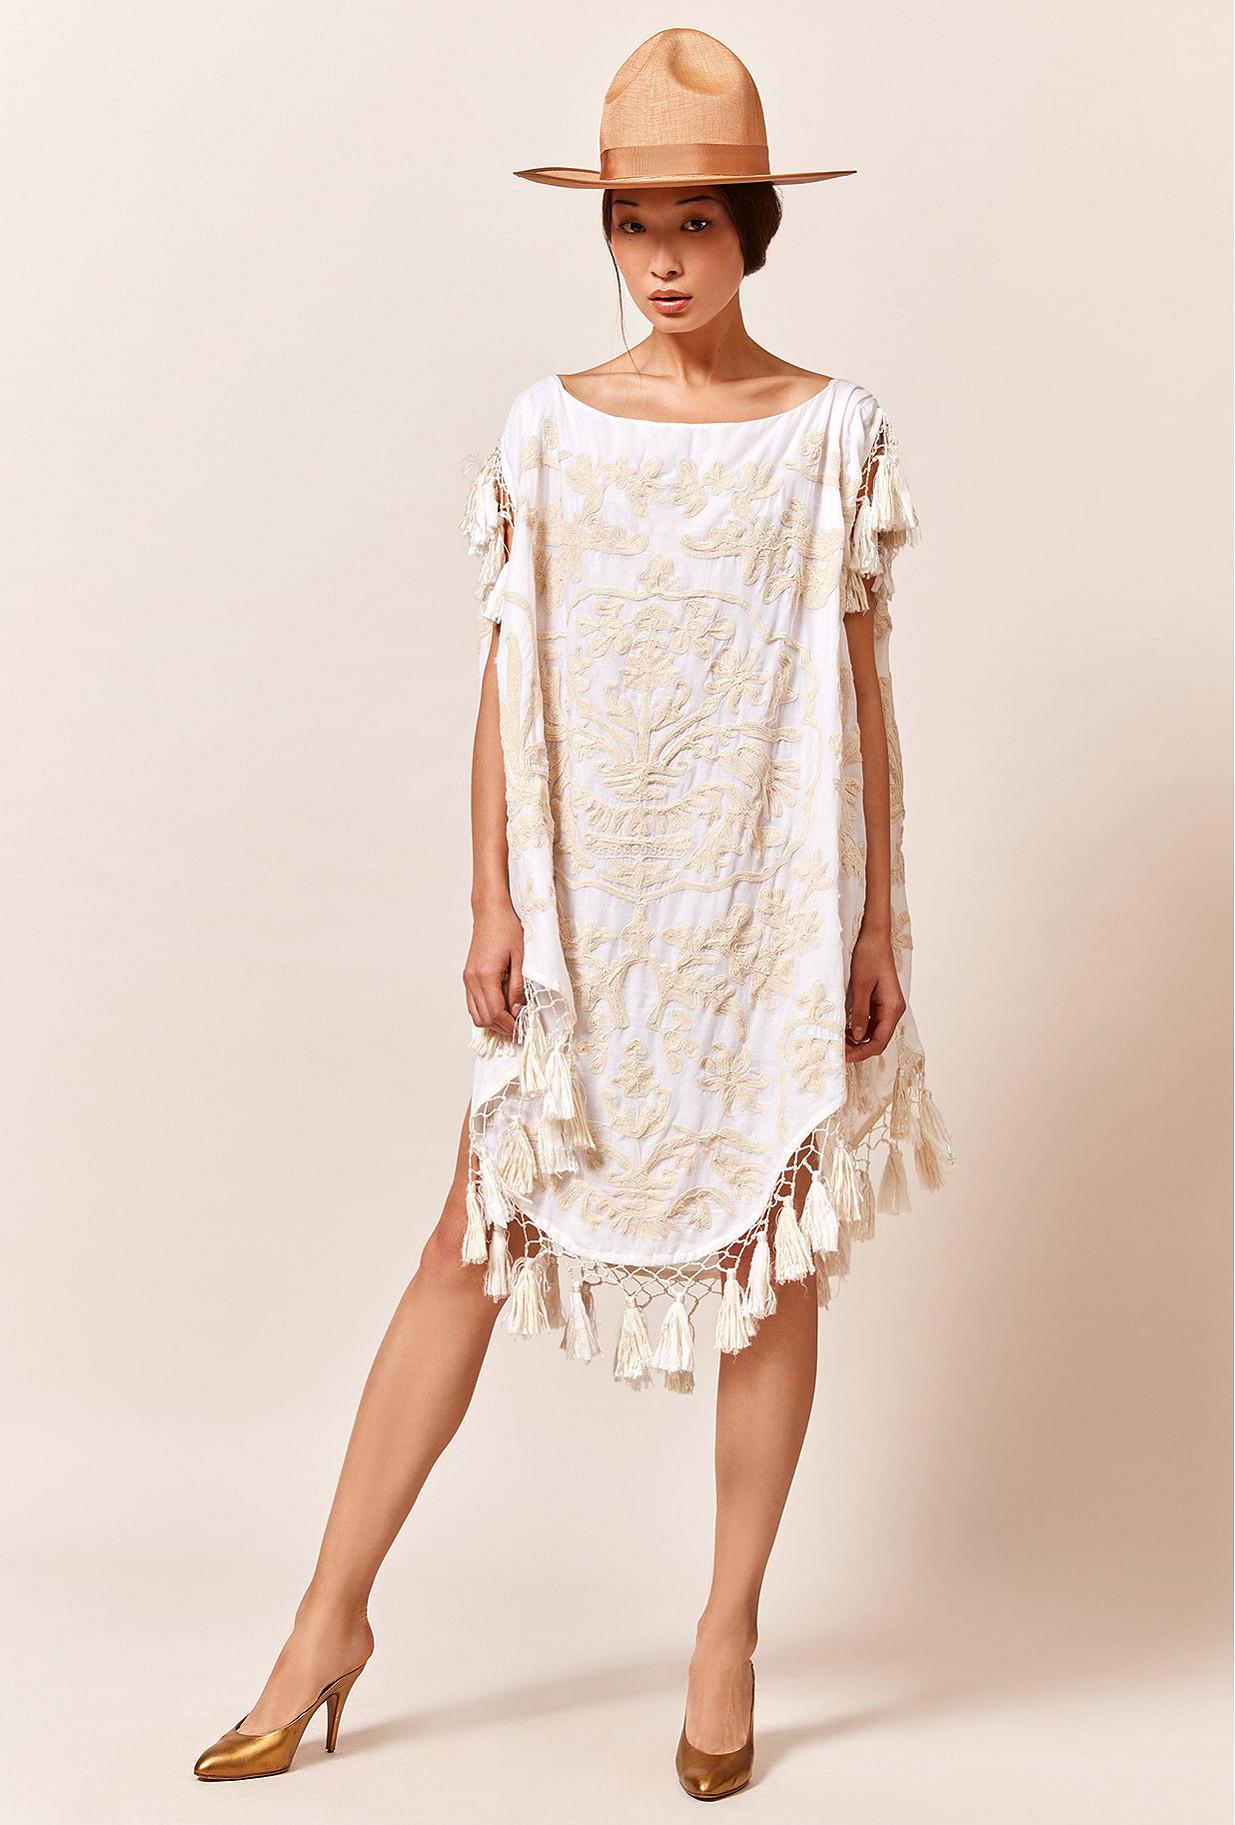 Paris clothes store Poncho  Bora-bora french designer fashion Paris